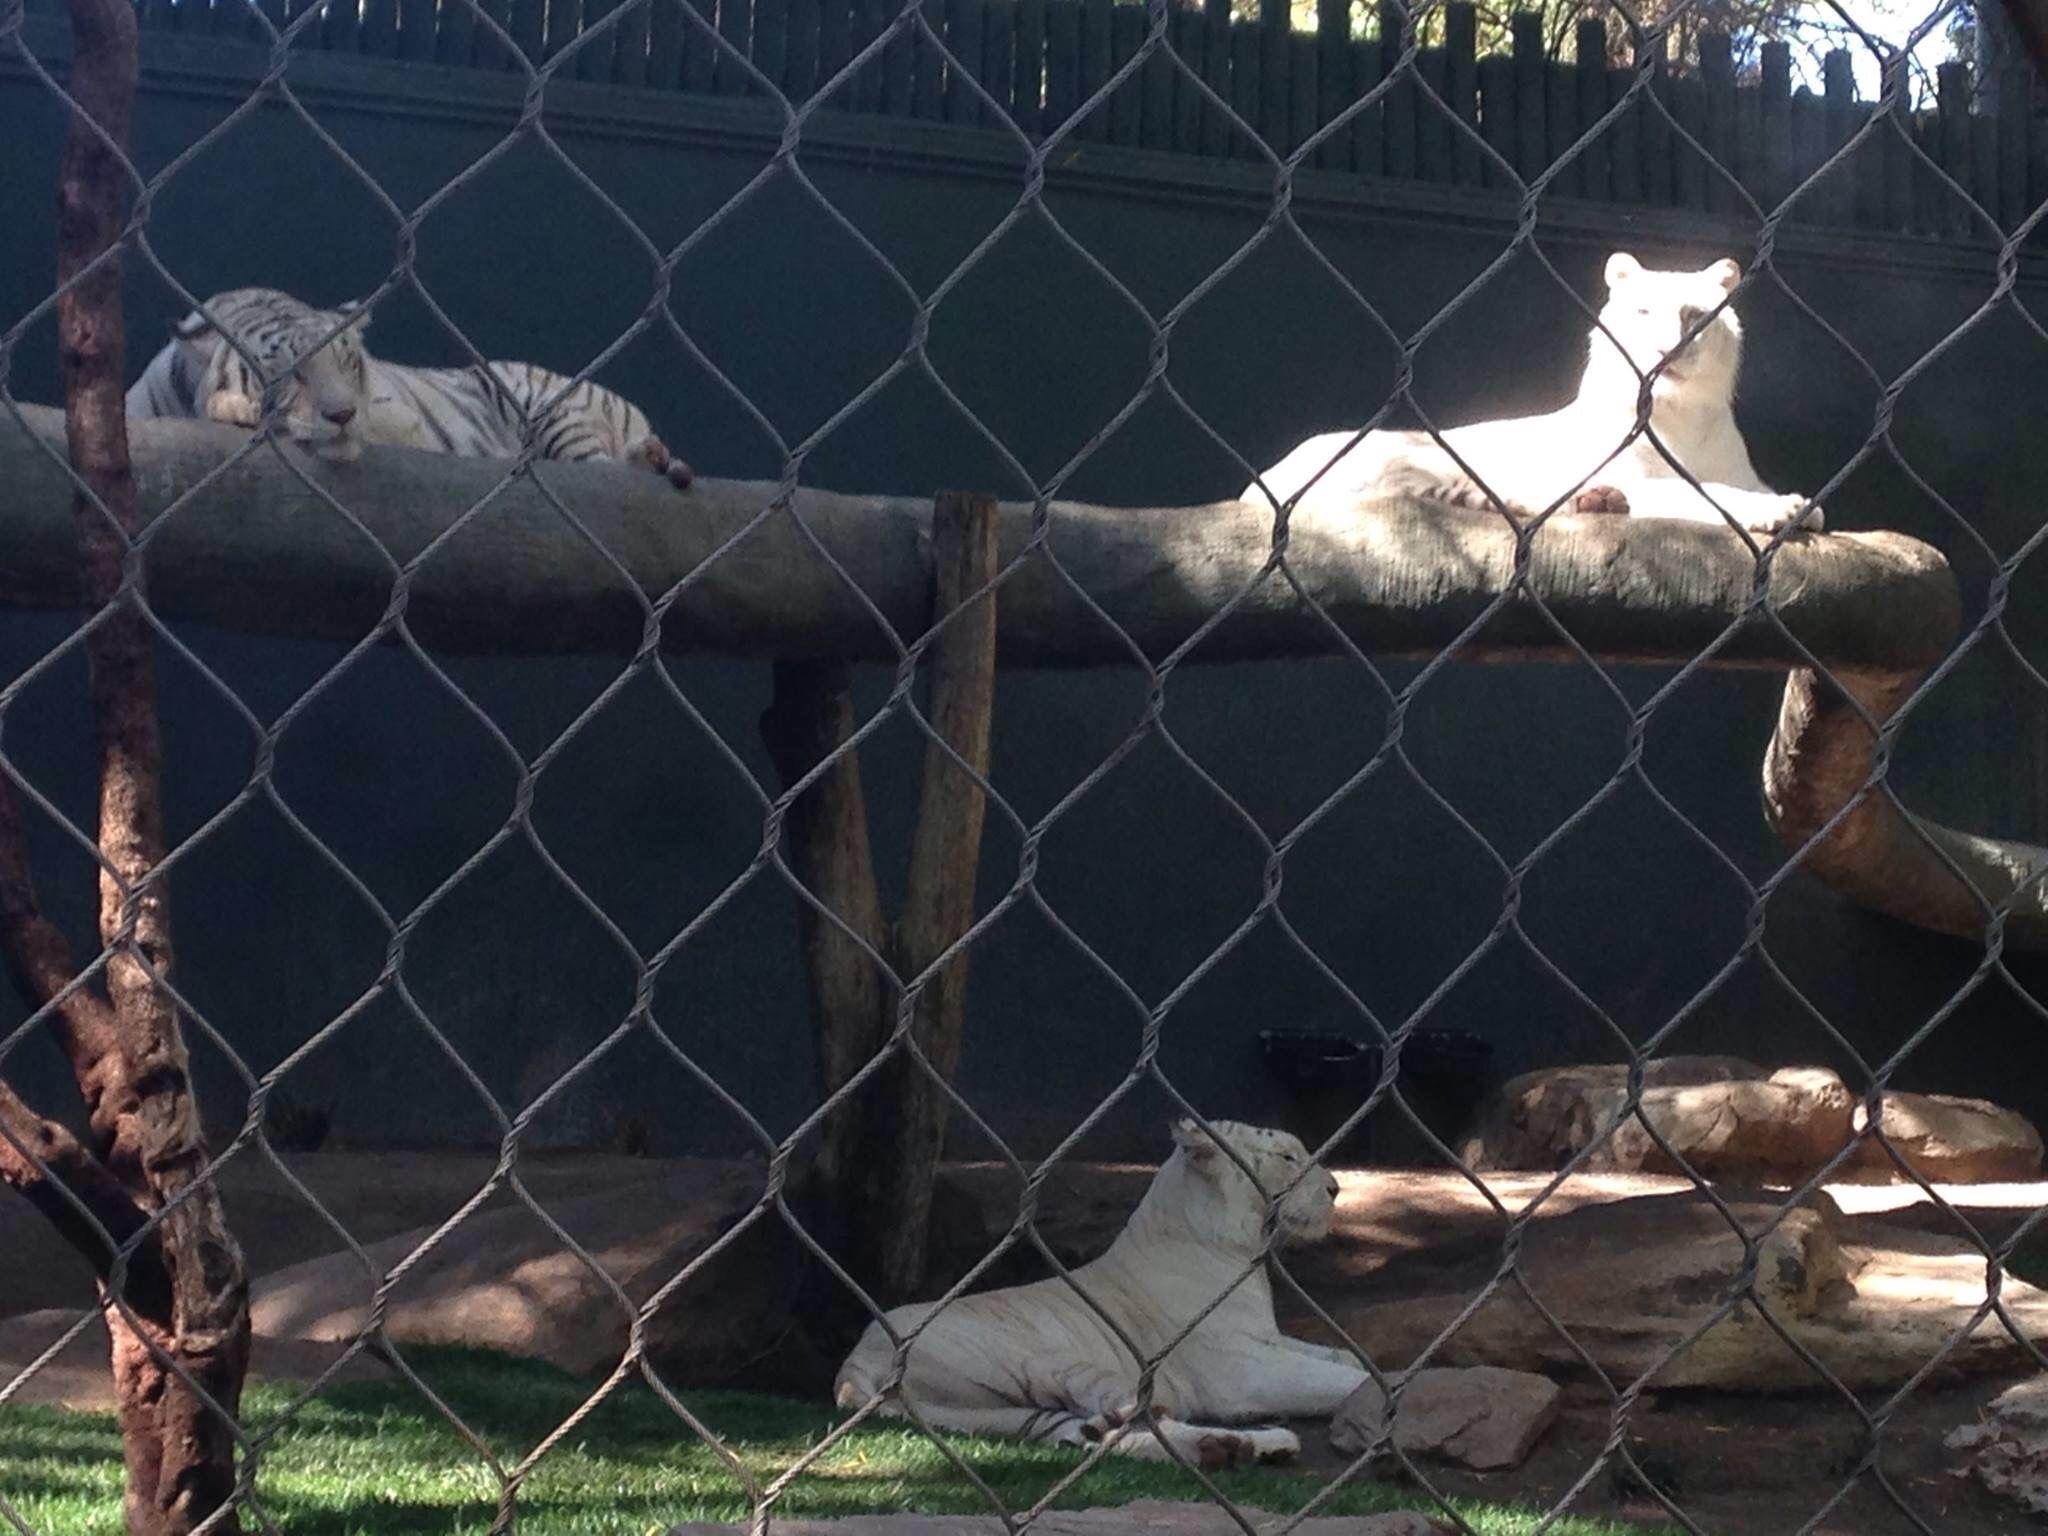 White tigers in Siegfried and Roy's Secret Garden, Mirage Las Vegas